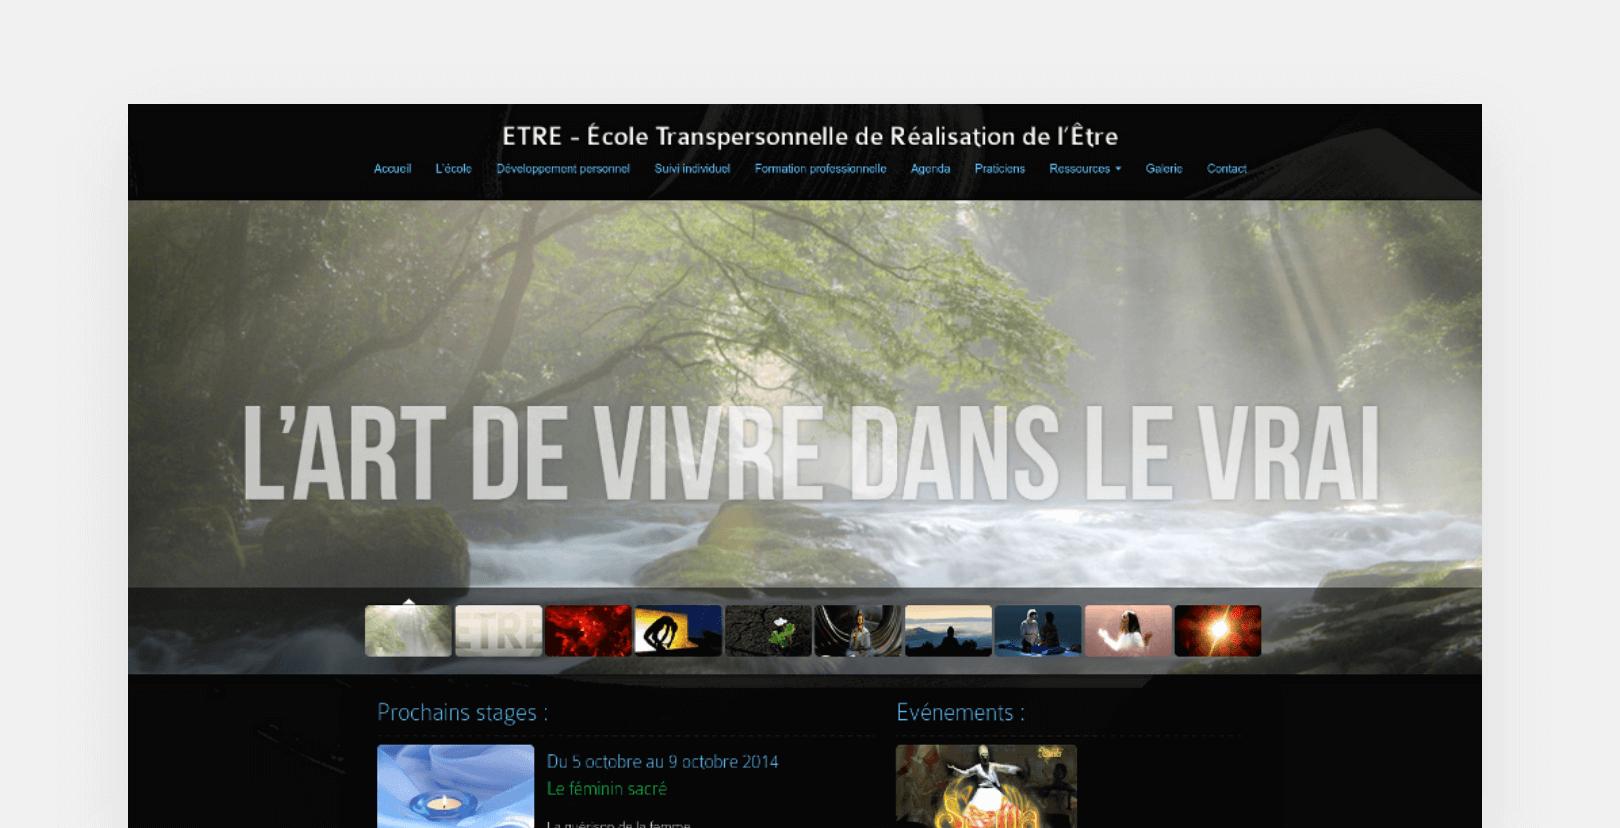 Ecole Etre home page screenshot